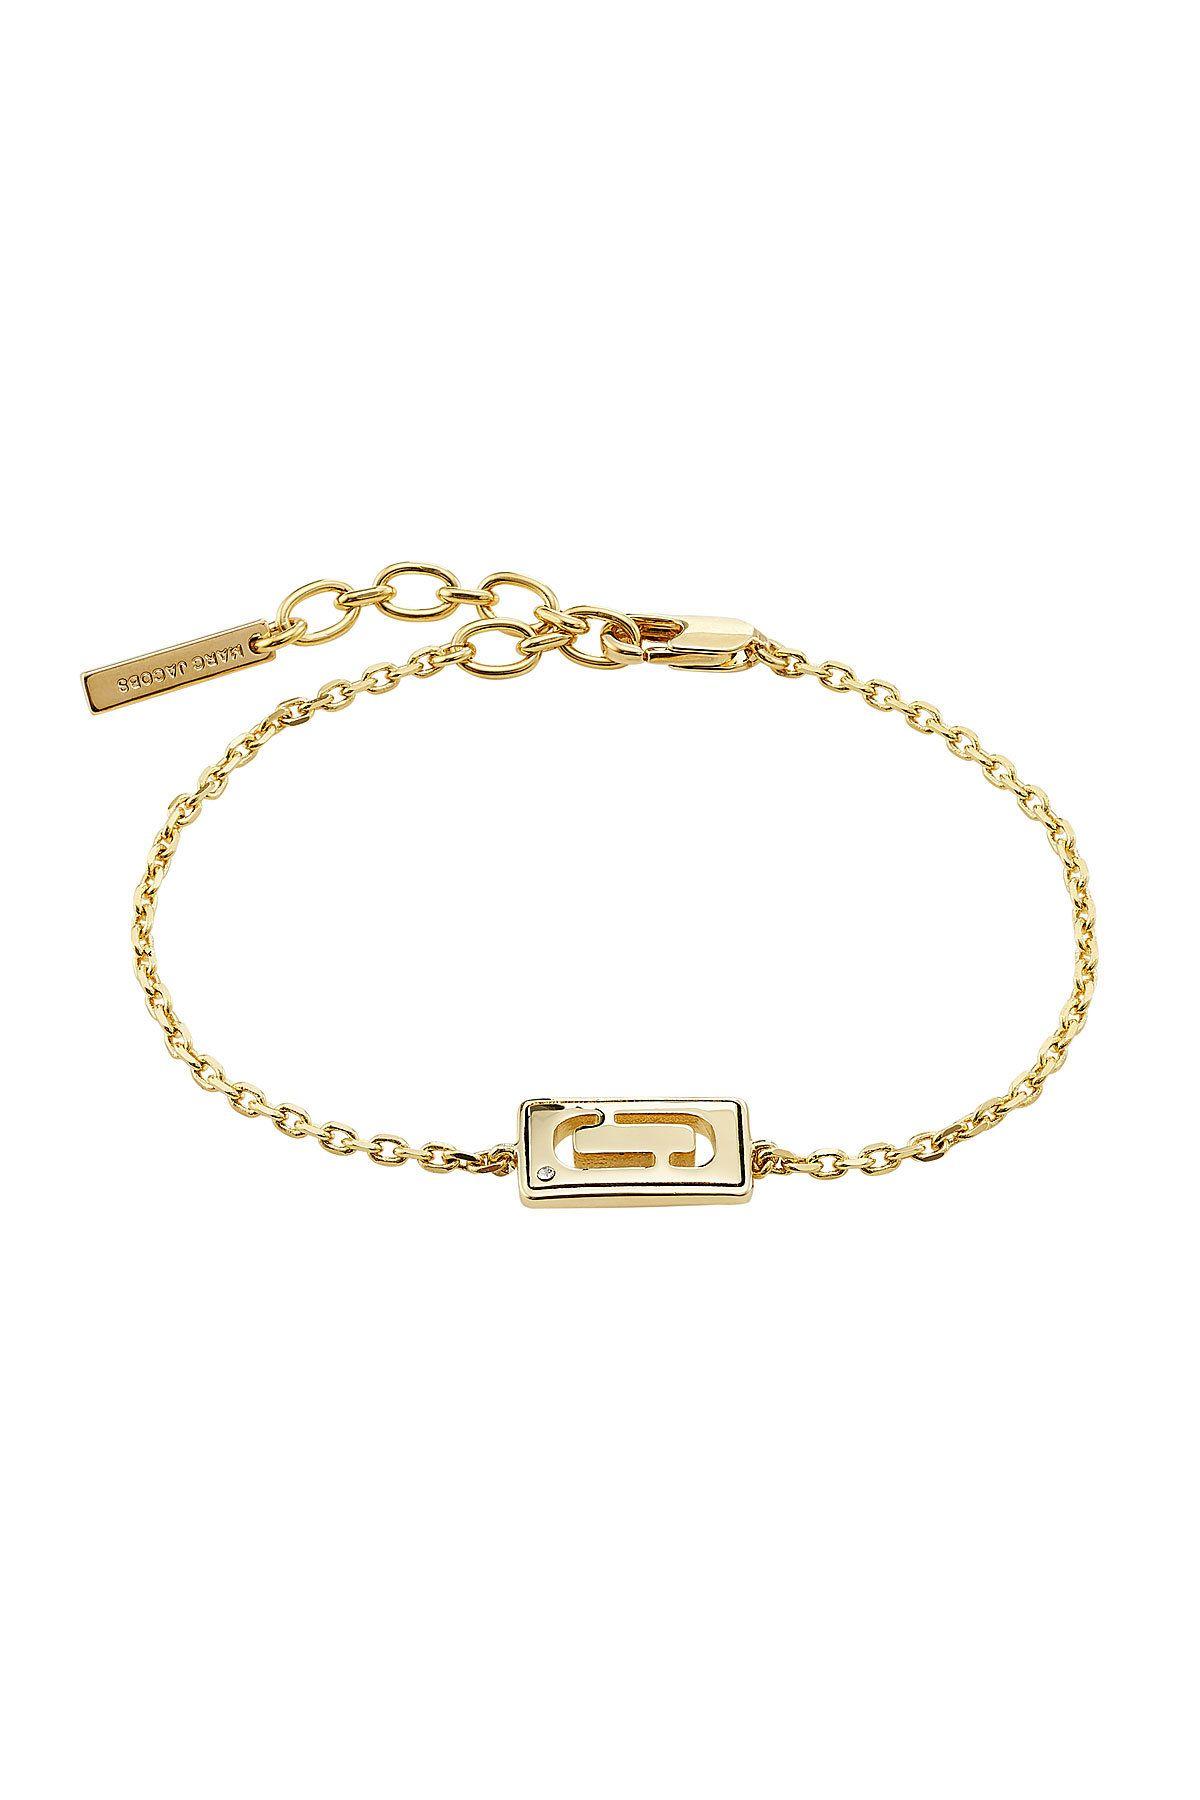 Marc jacobs logo bracelet accessories pinterest logos